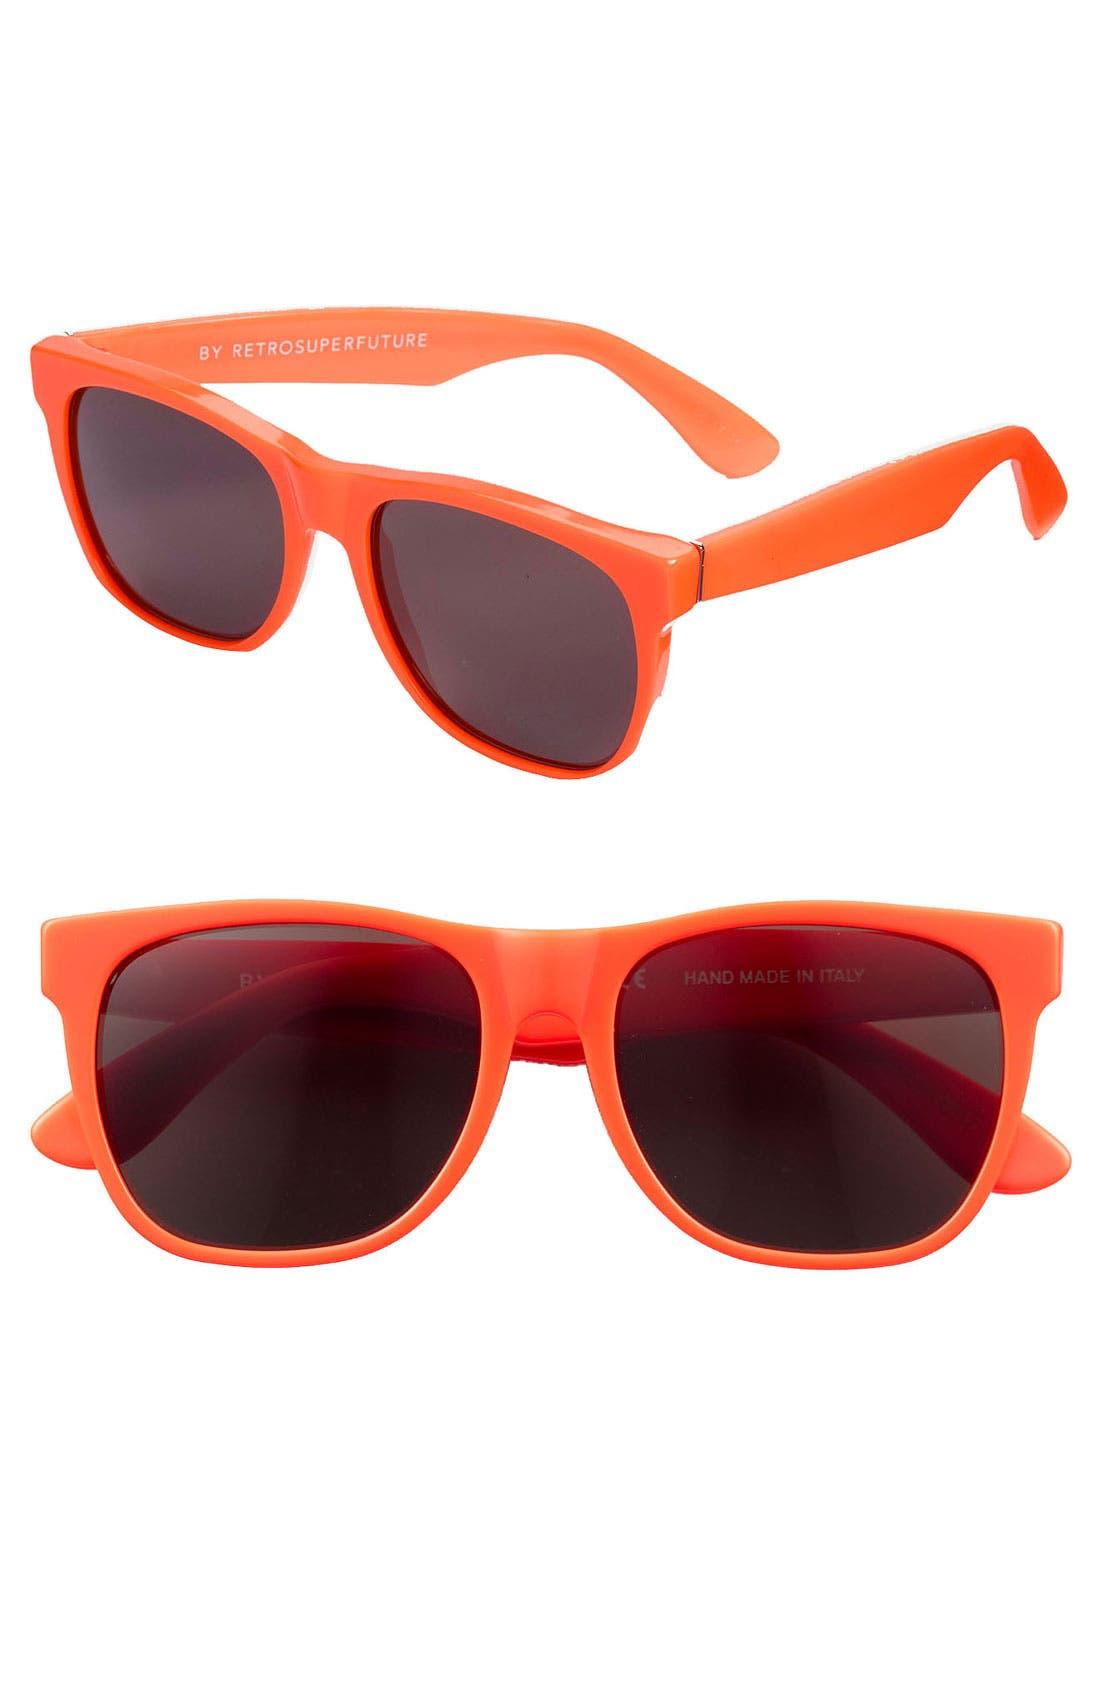 Main Image - SUPER by RETROSUPERFUTURE® 'Classic' 55mm Sunglasses